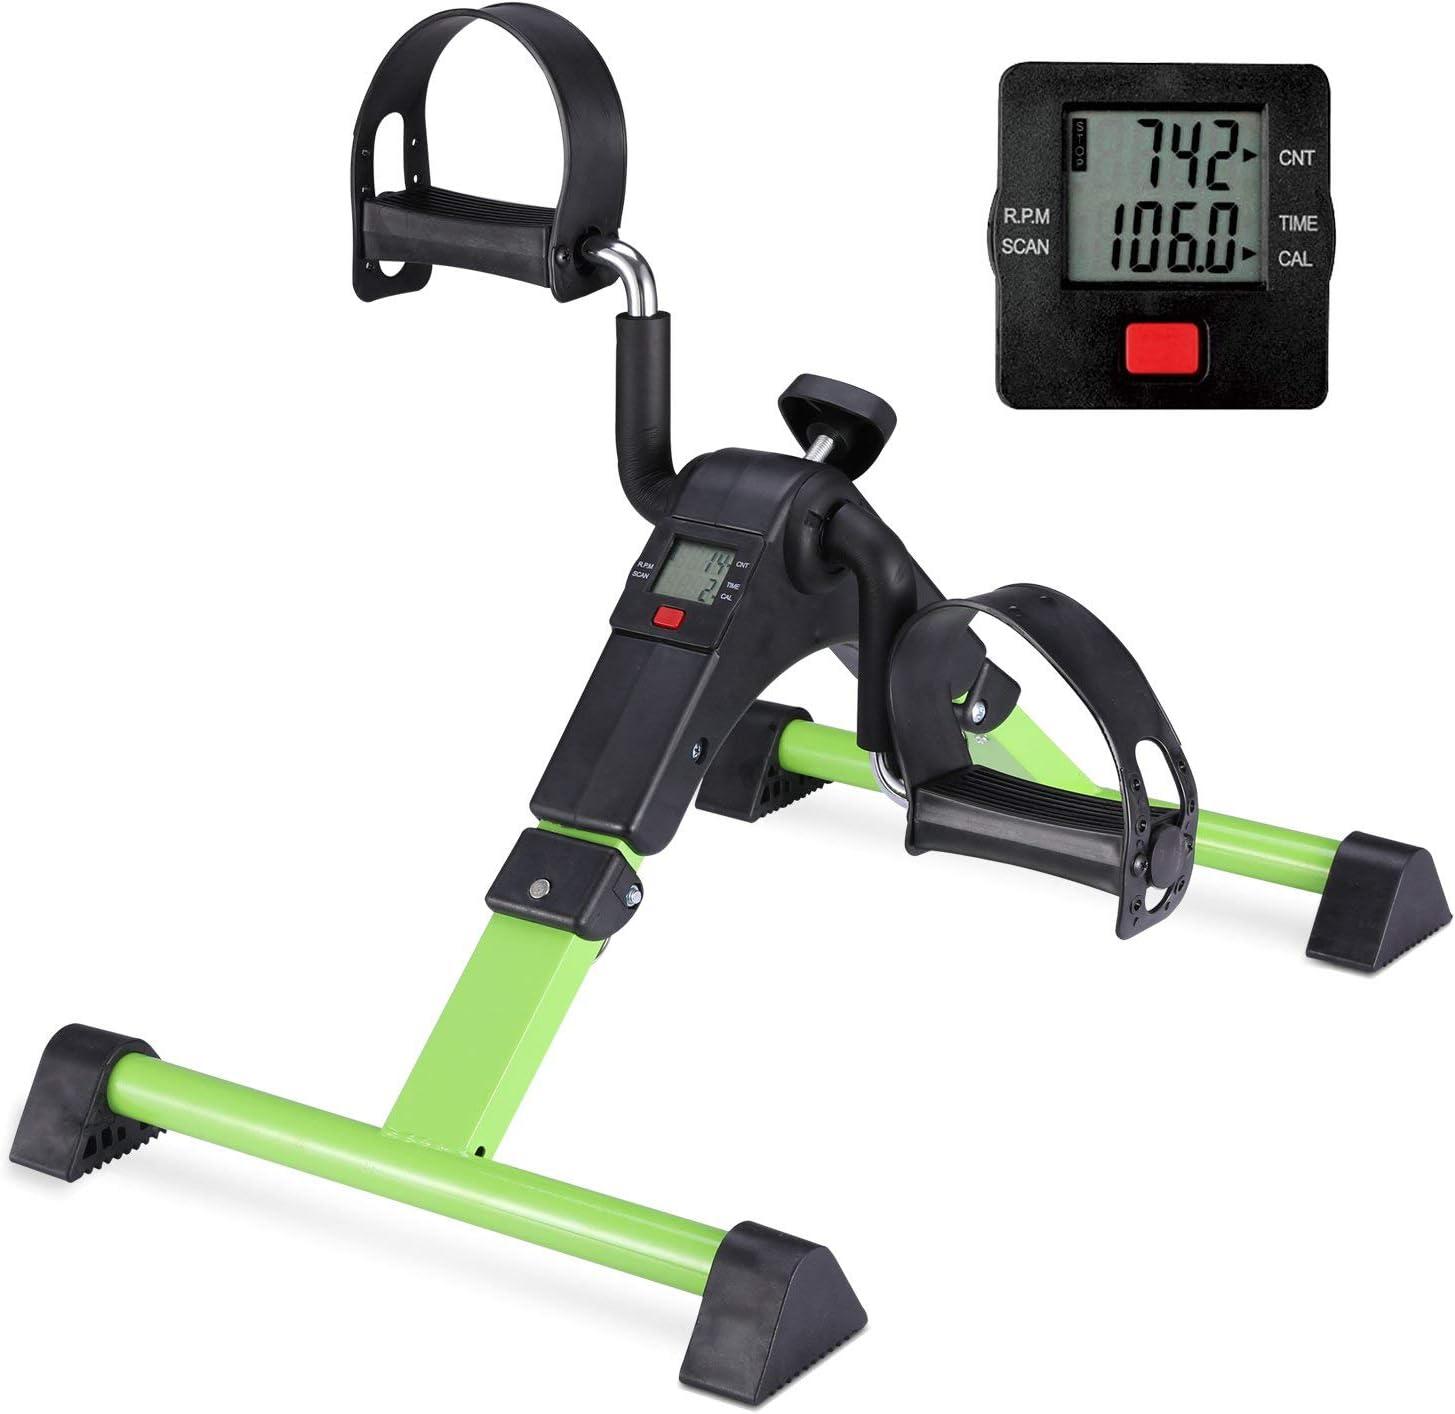 trust Special sale item MOMODA Under Desk Bike Pedal Exerciser Ped Leg Arm for Mini